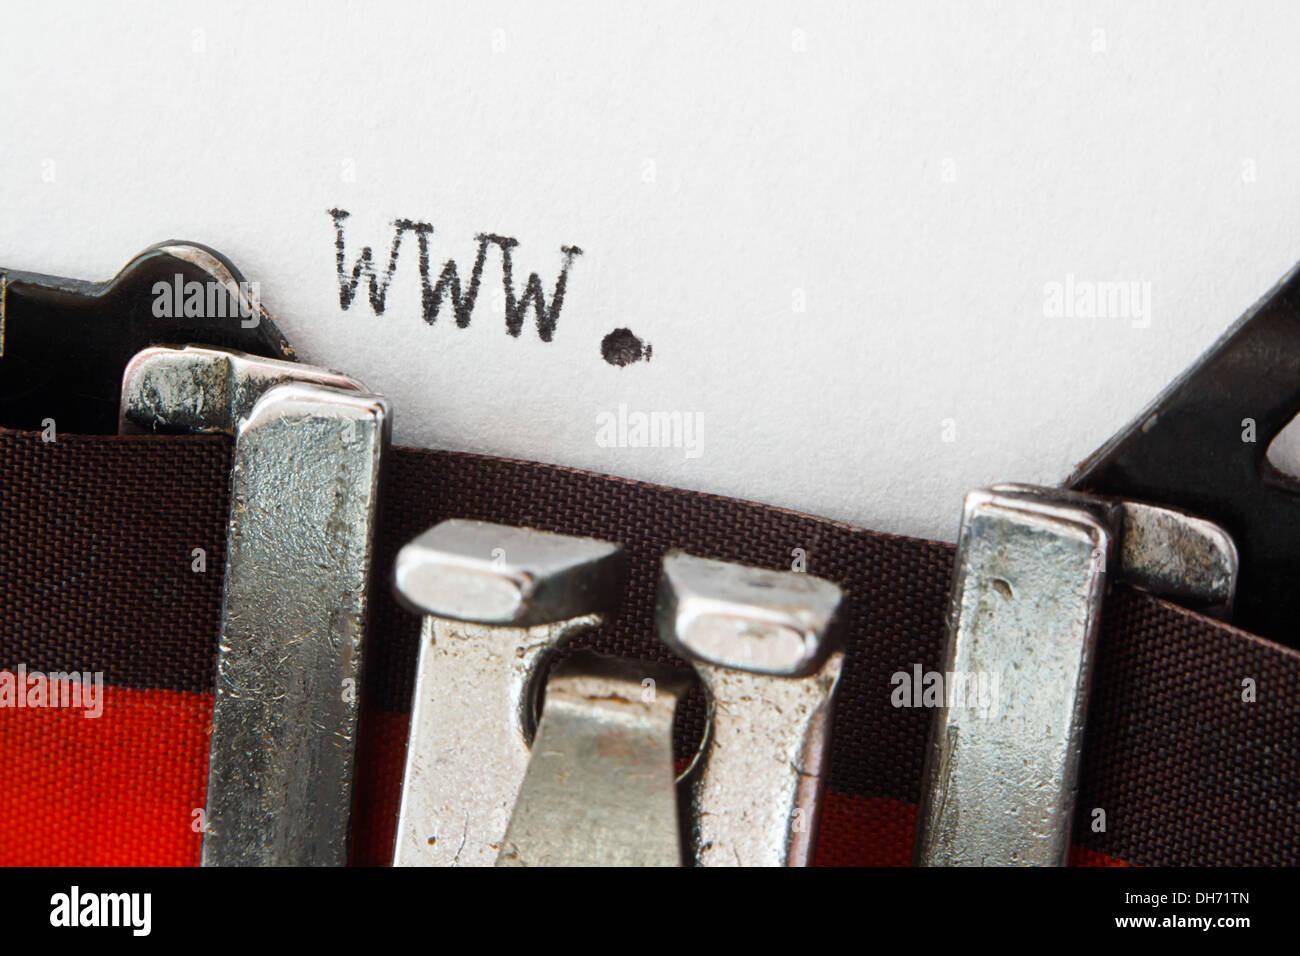 www. website prefix typed on a vintage typewriter - Stock Image